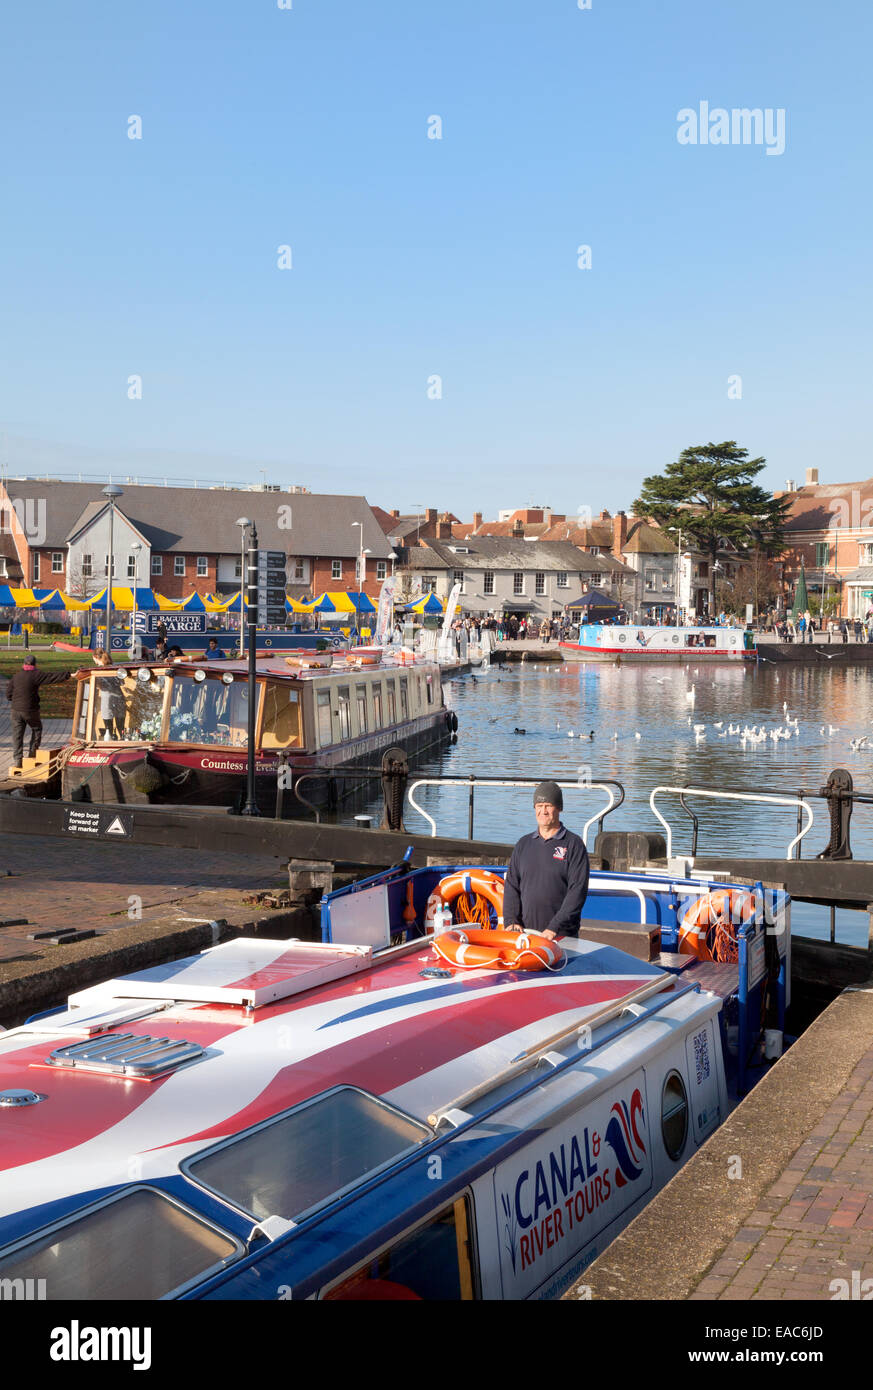 Narrow boats in the Canal Basin, Stratford upon Avon, Warwickshire, England UK - Stock Image